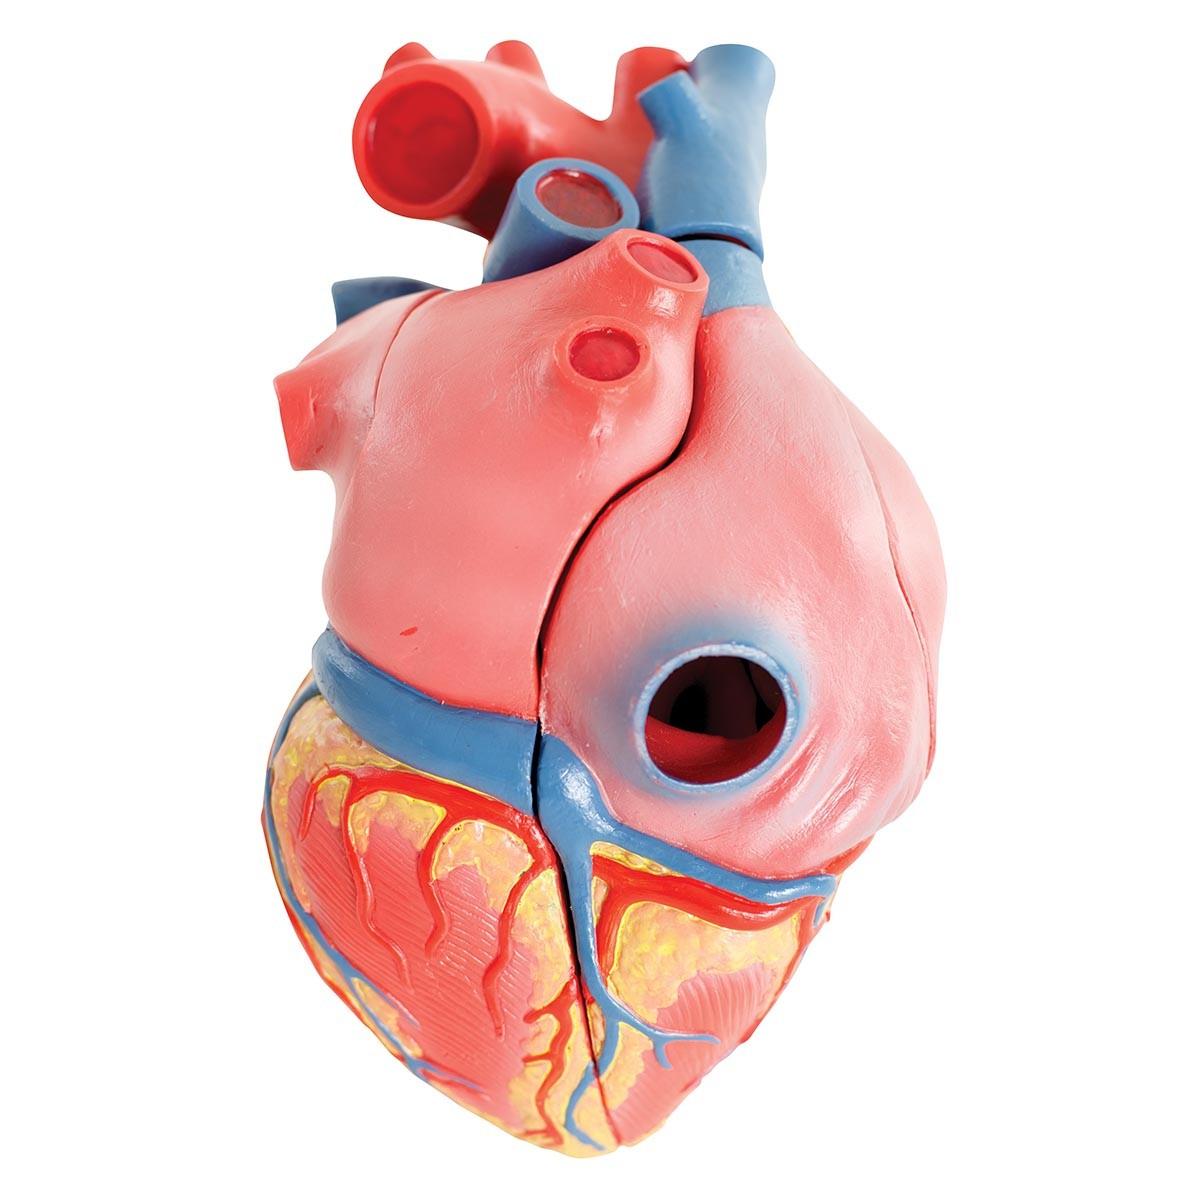 Herzmodell